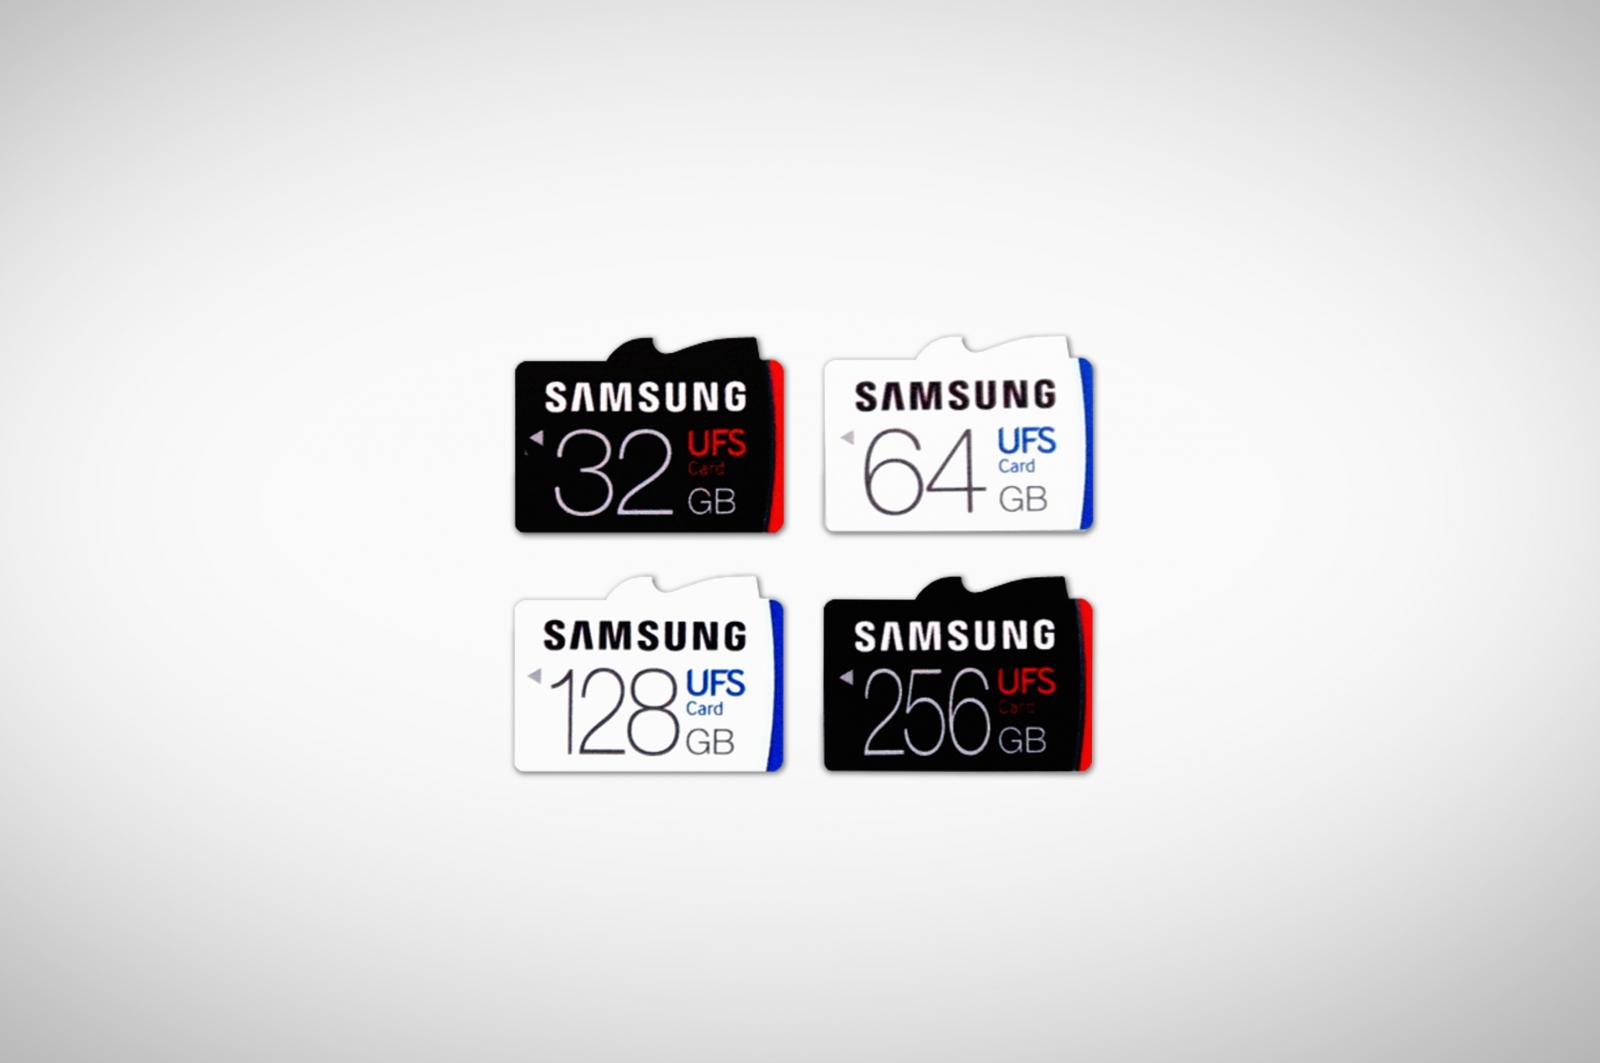 Samsung USF cards